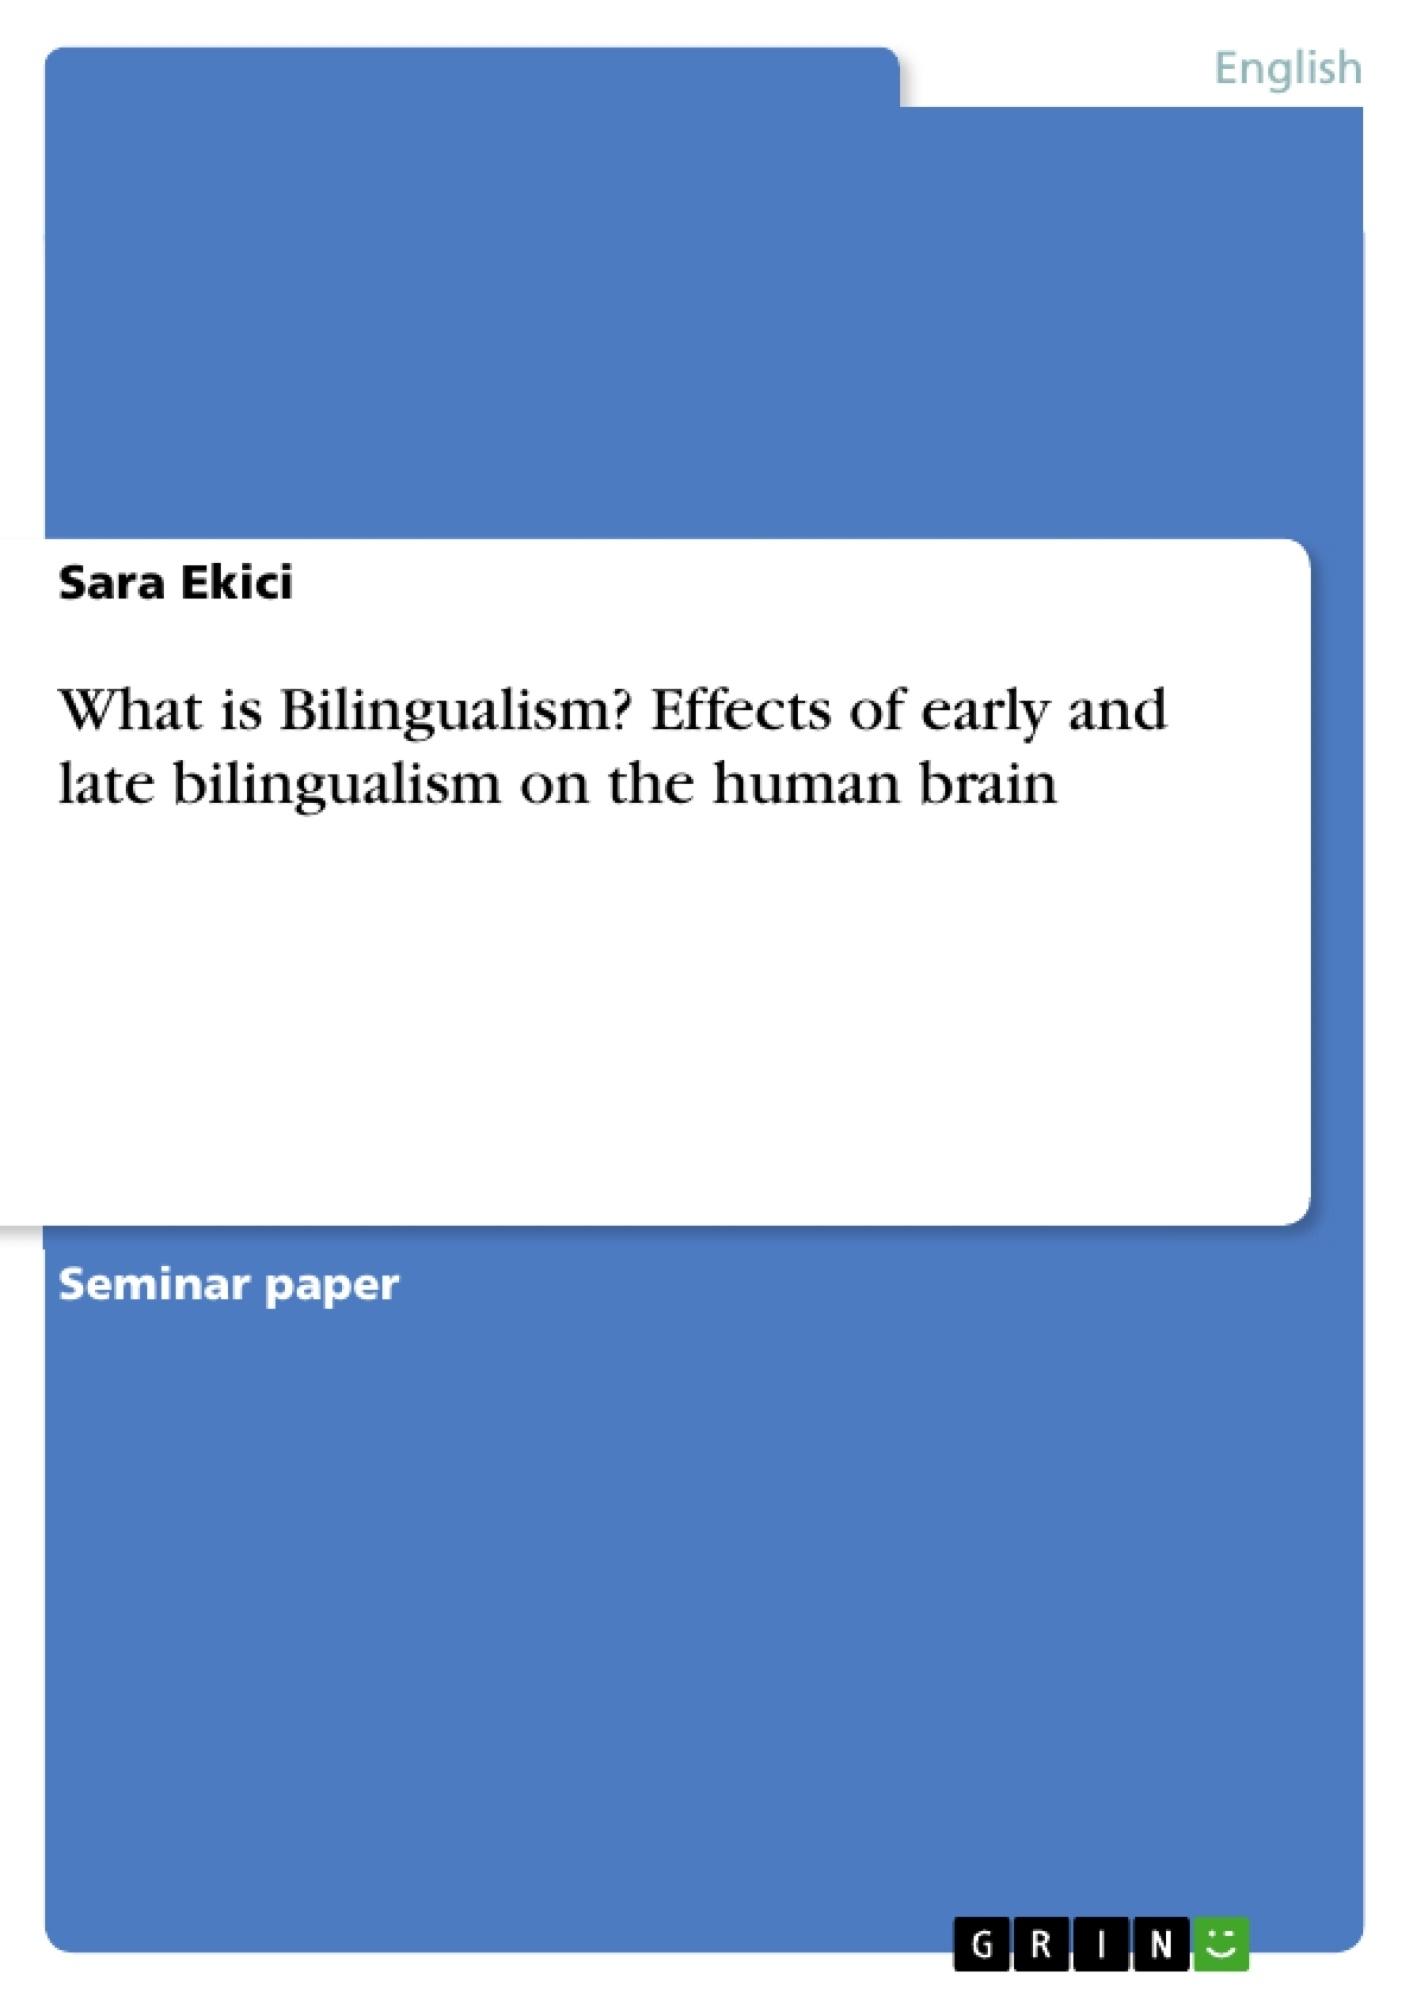 Thesis bilingualism